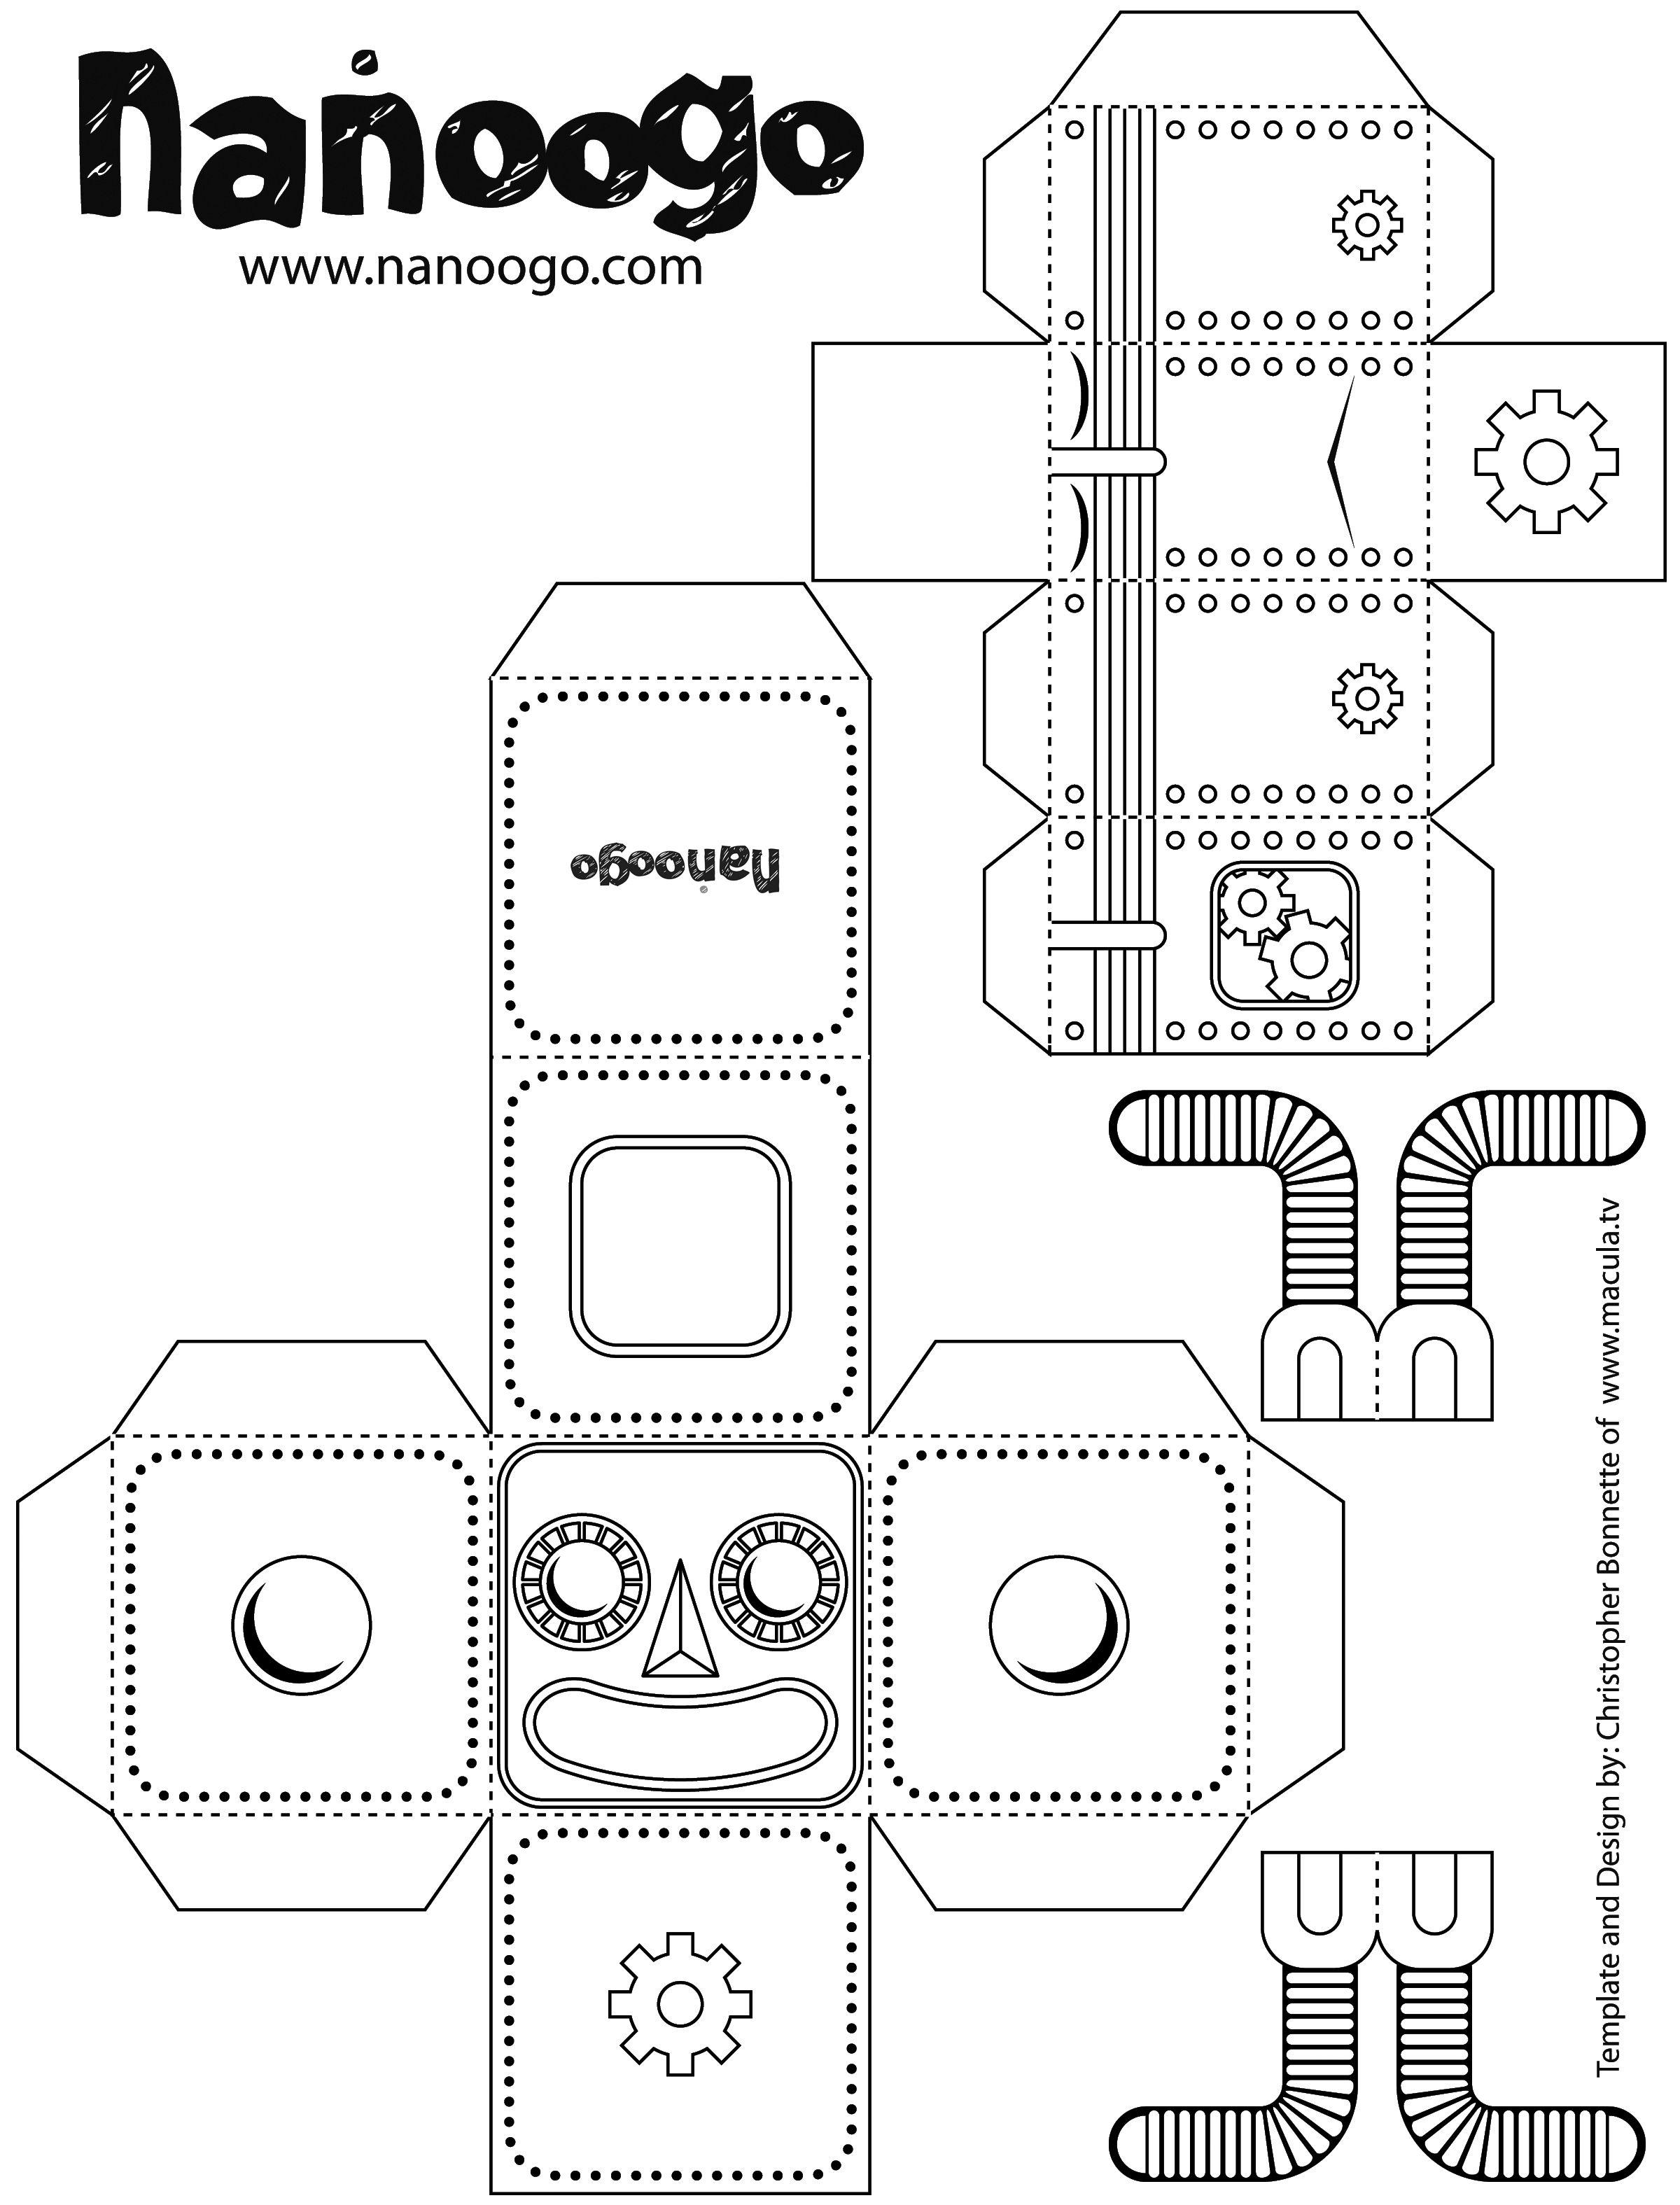 Nanoogo Robot